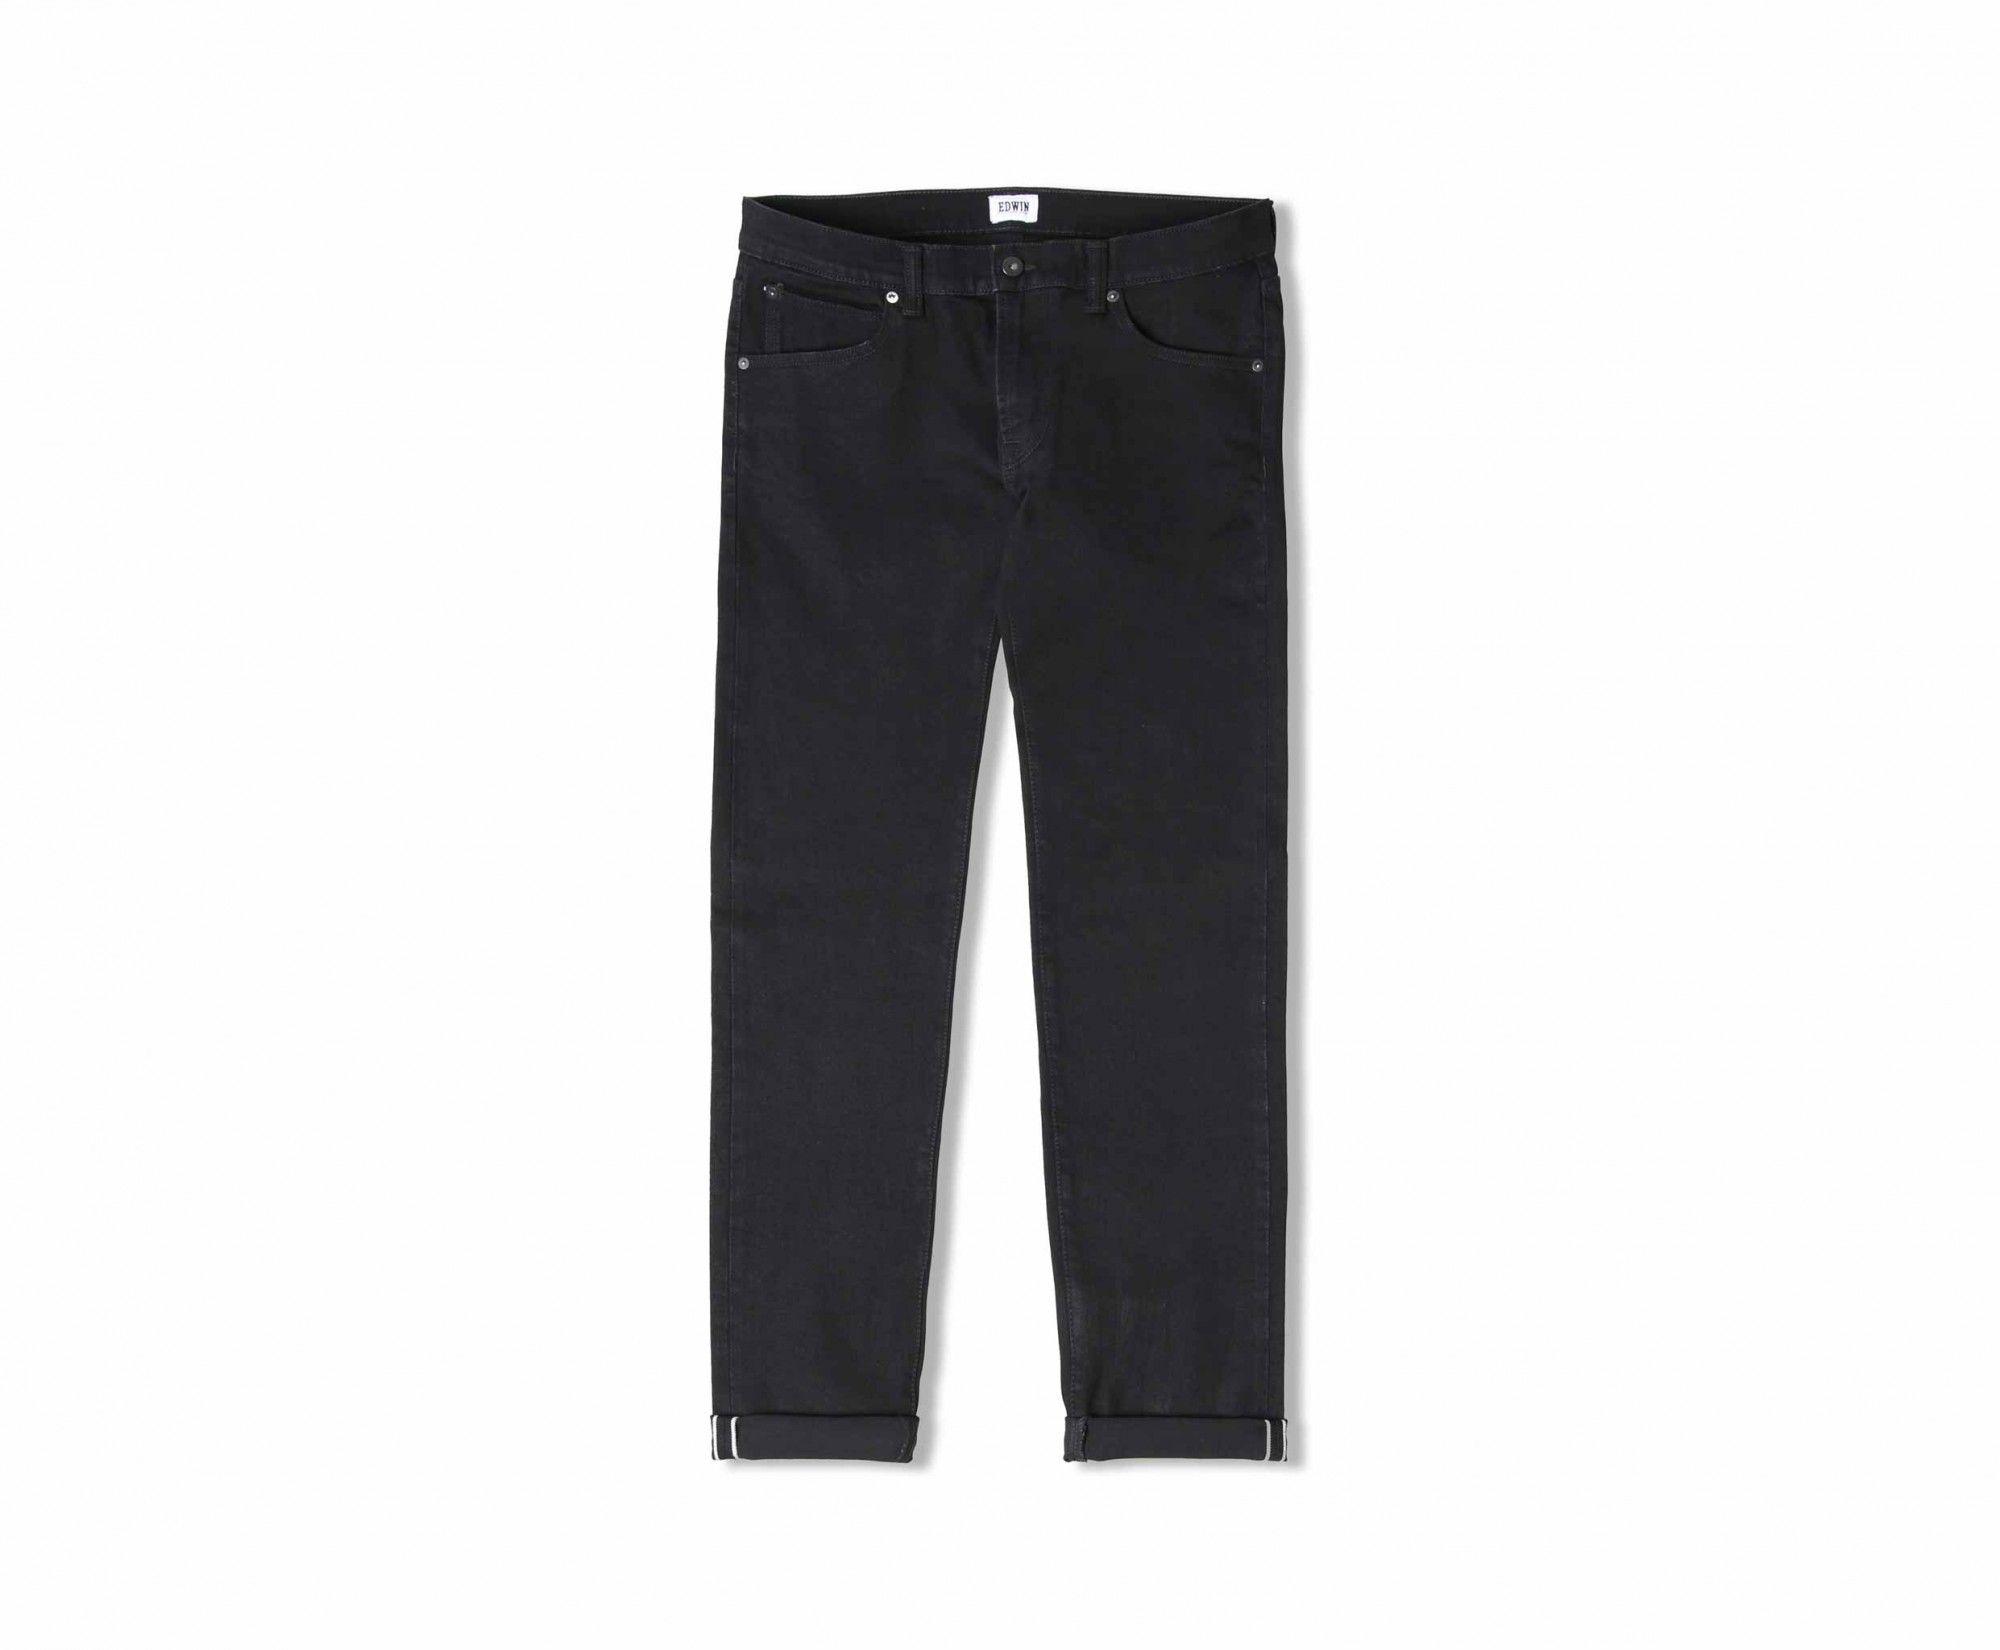 ED-85 Slim Tapered Jeans CS White Listed Black Selvage Stretch Denim - Rinsed